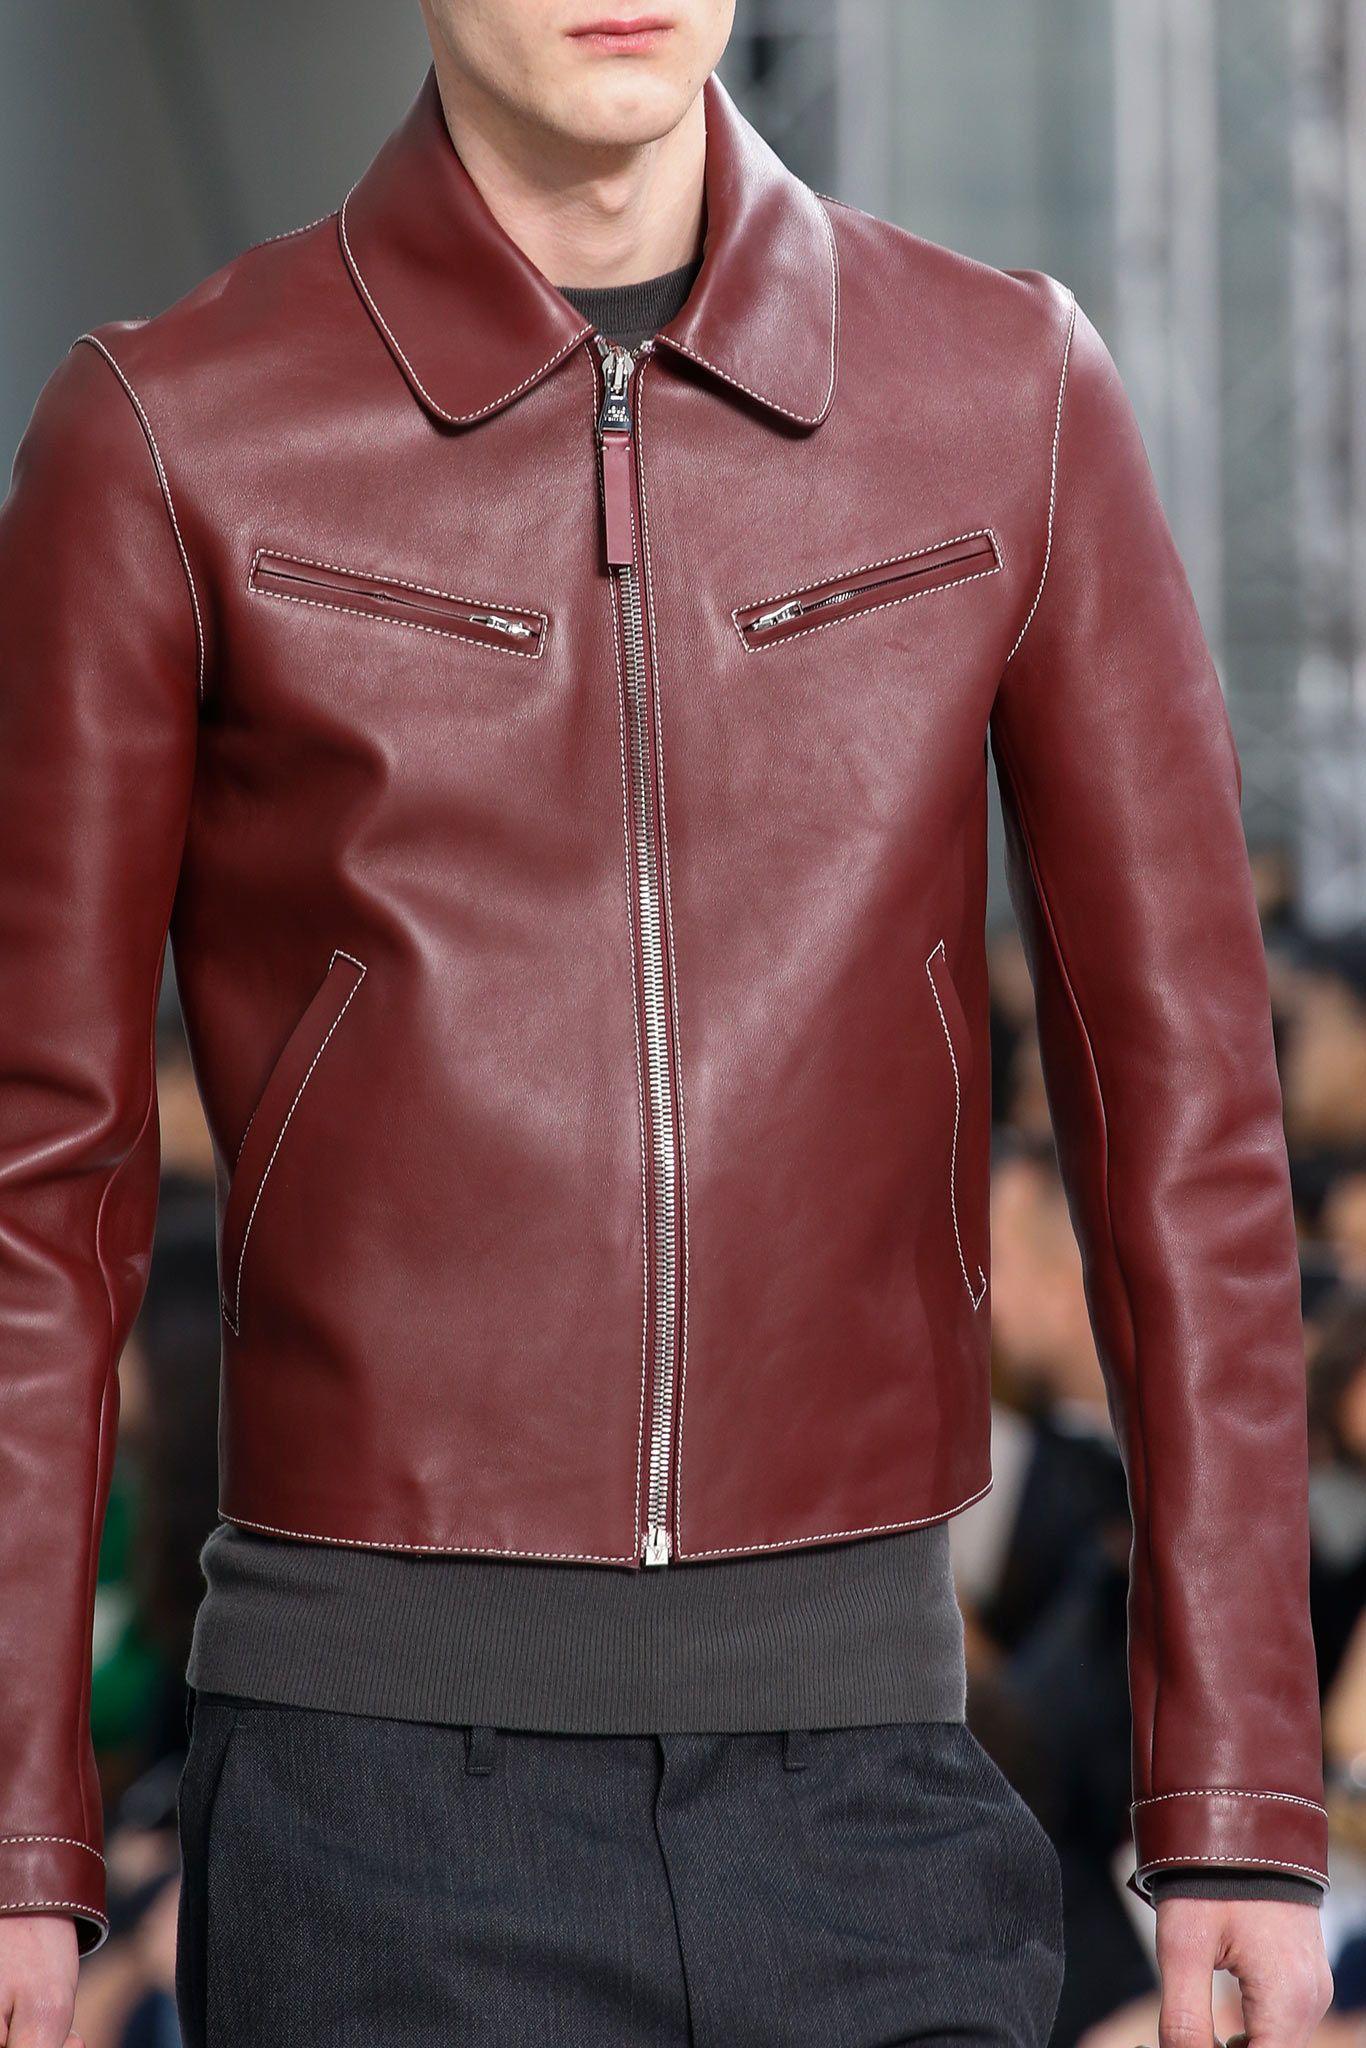 Louis Vuitton Fall 2015 Menswear Collection Gallery